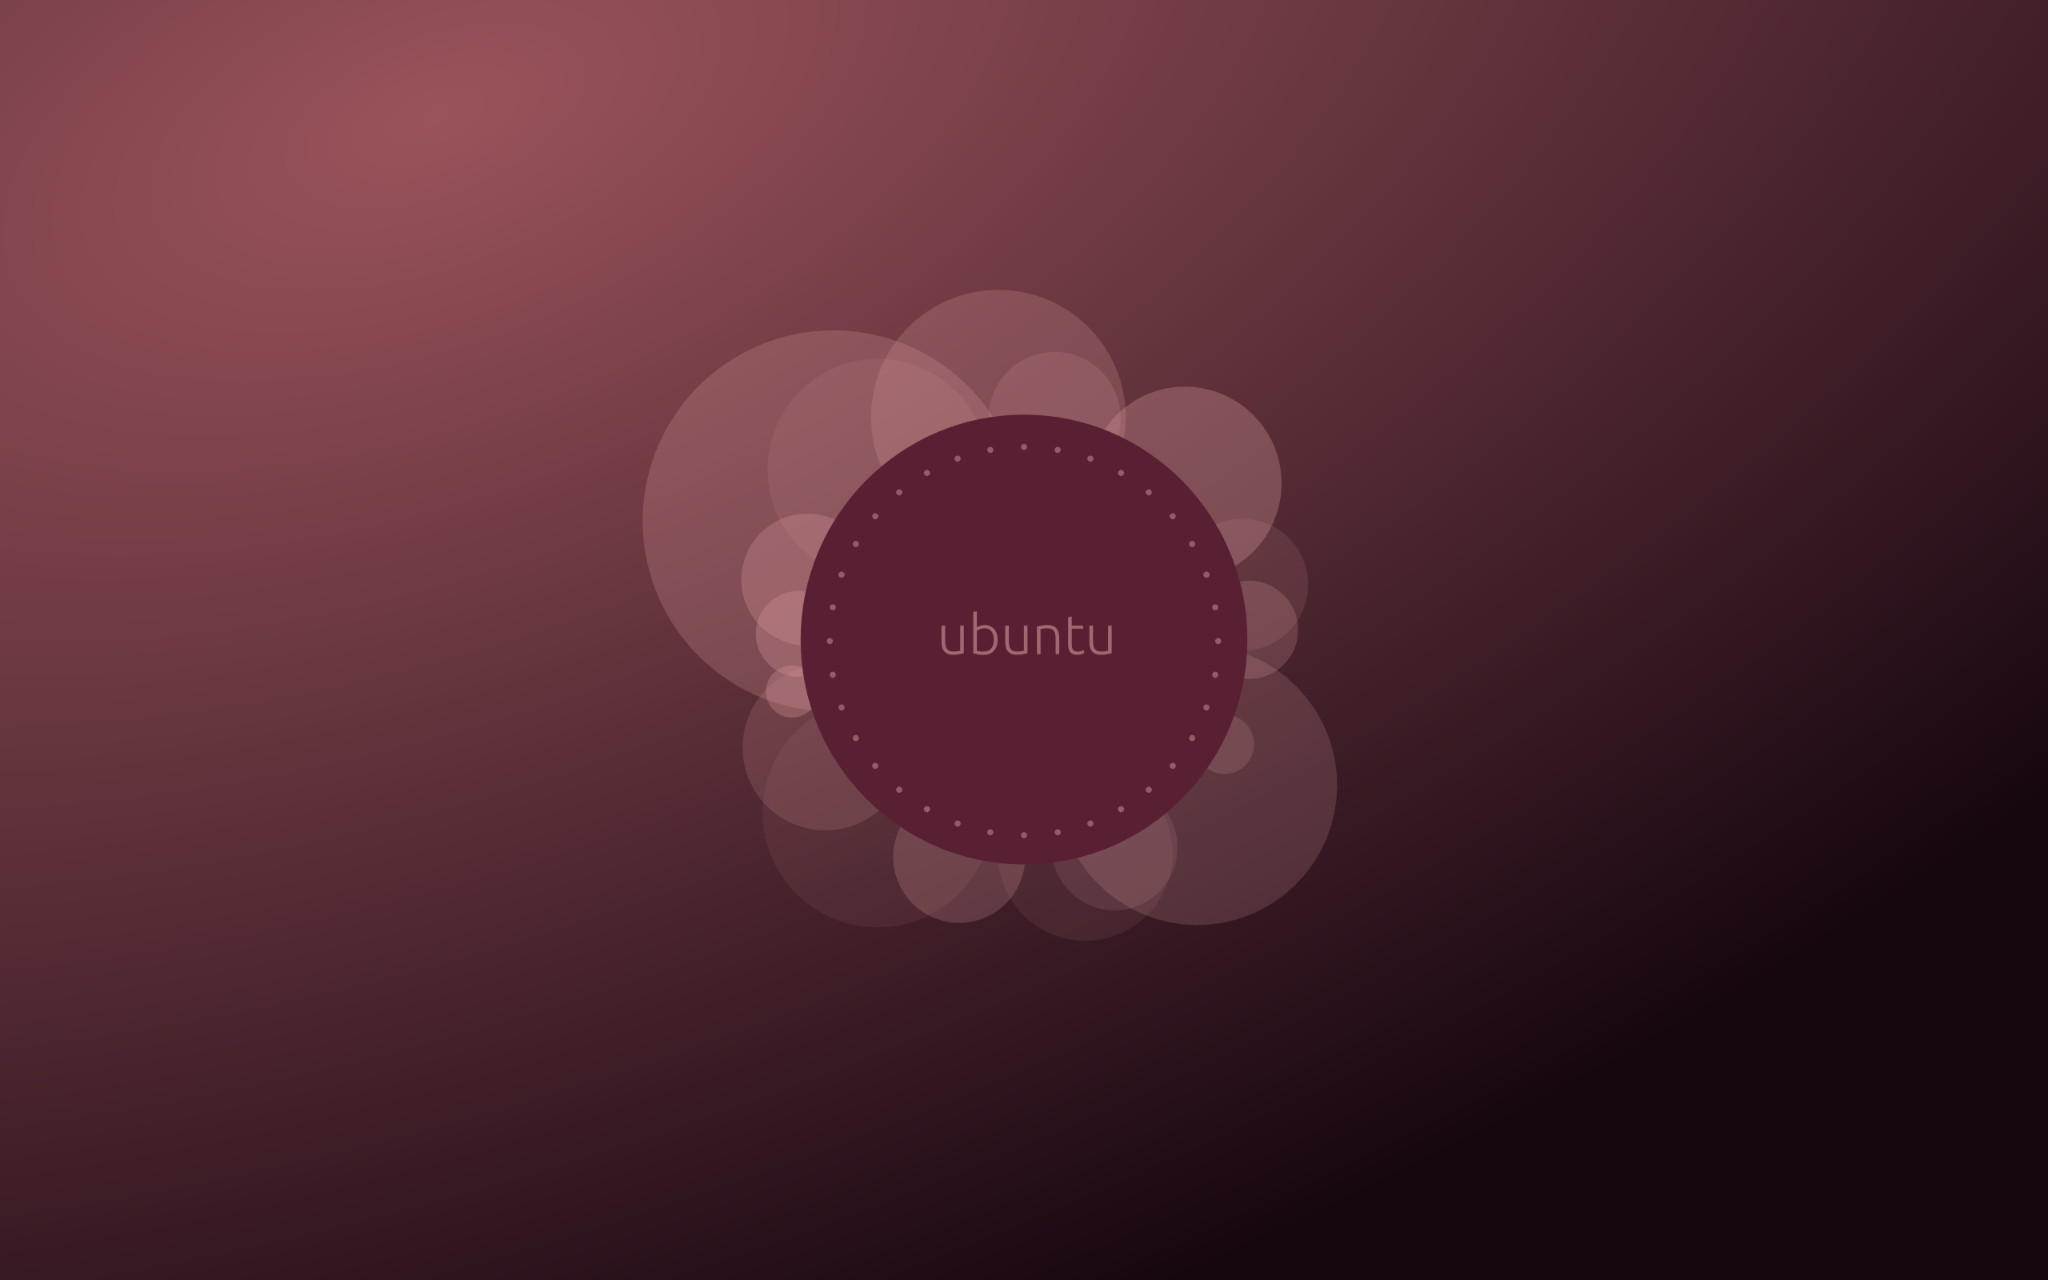 Ubuntu Wallpapers HD 2048x1280